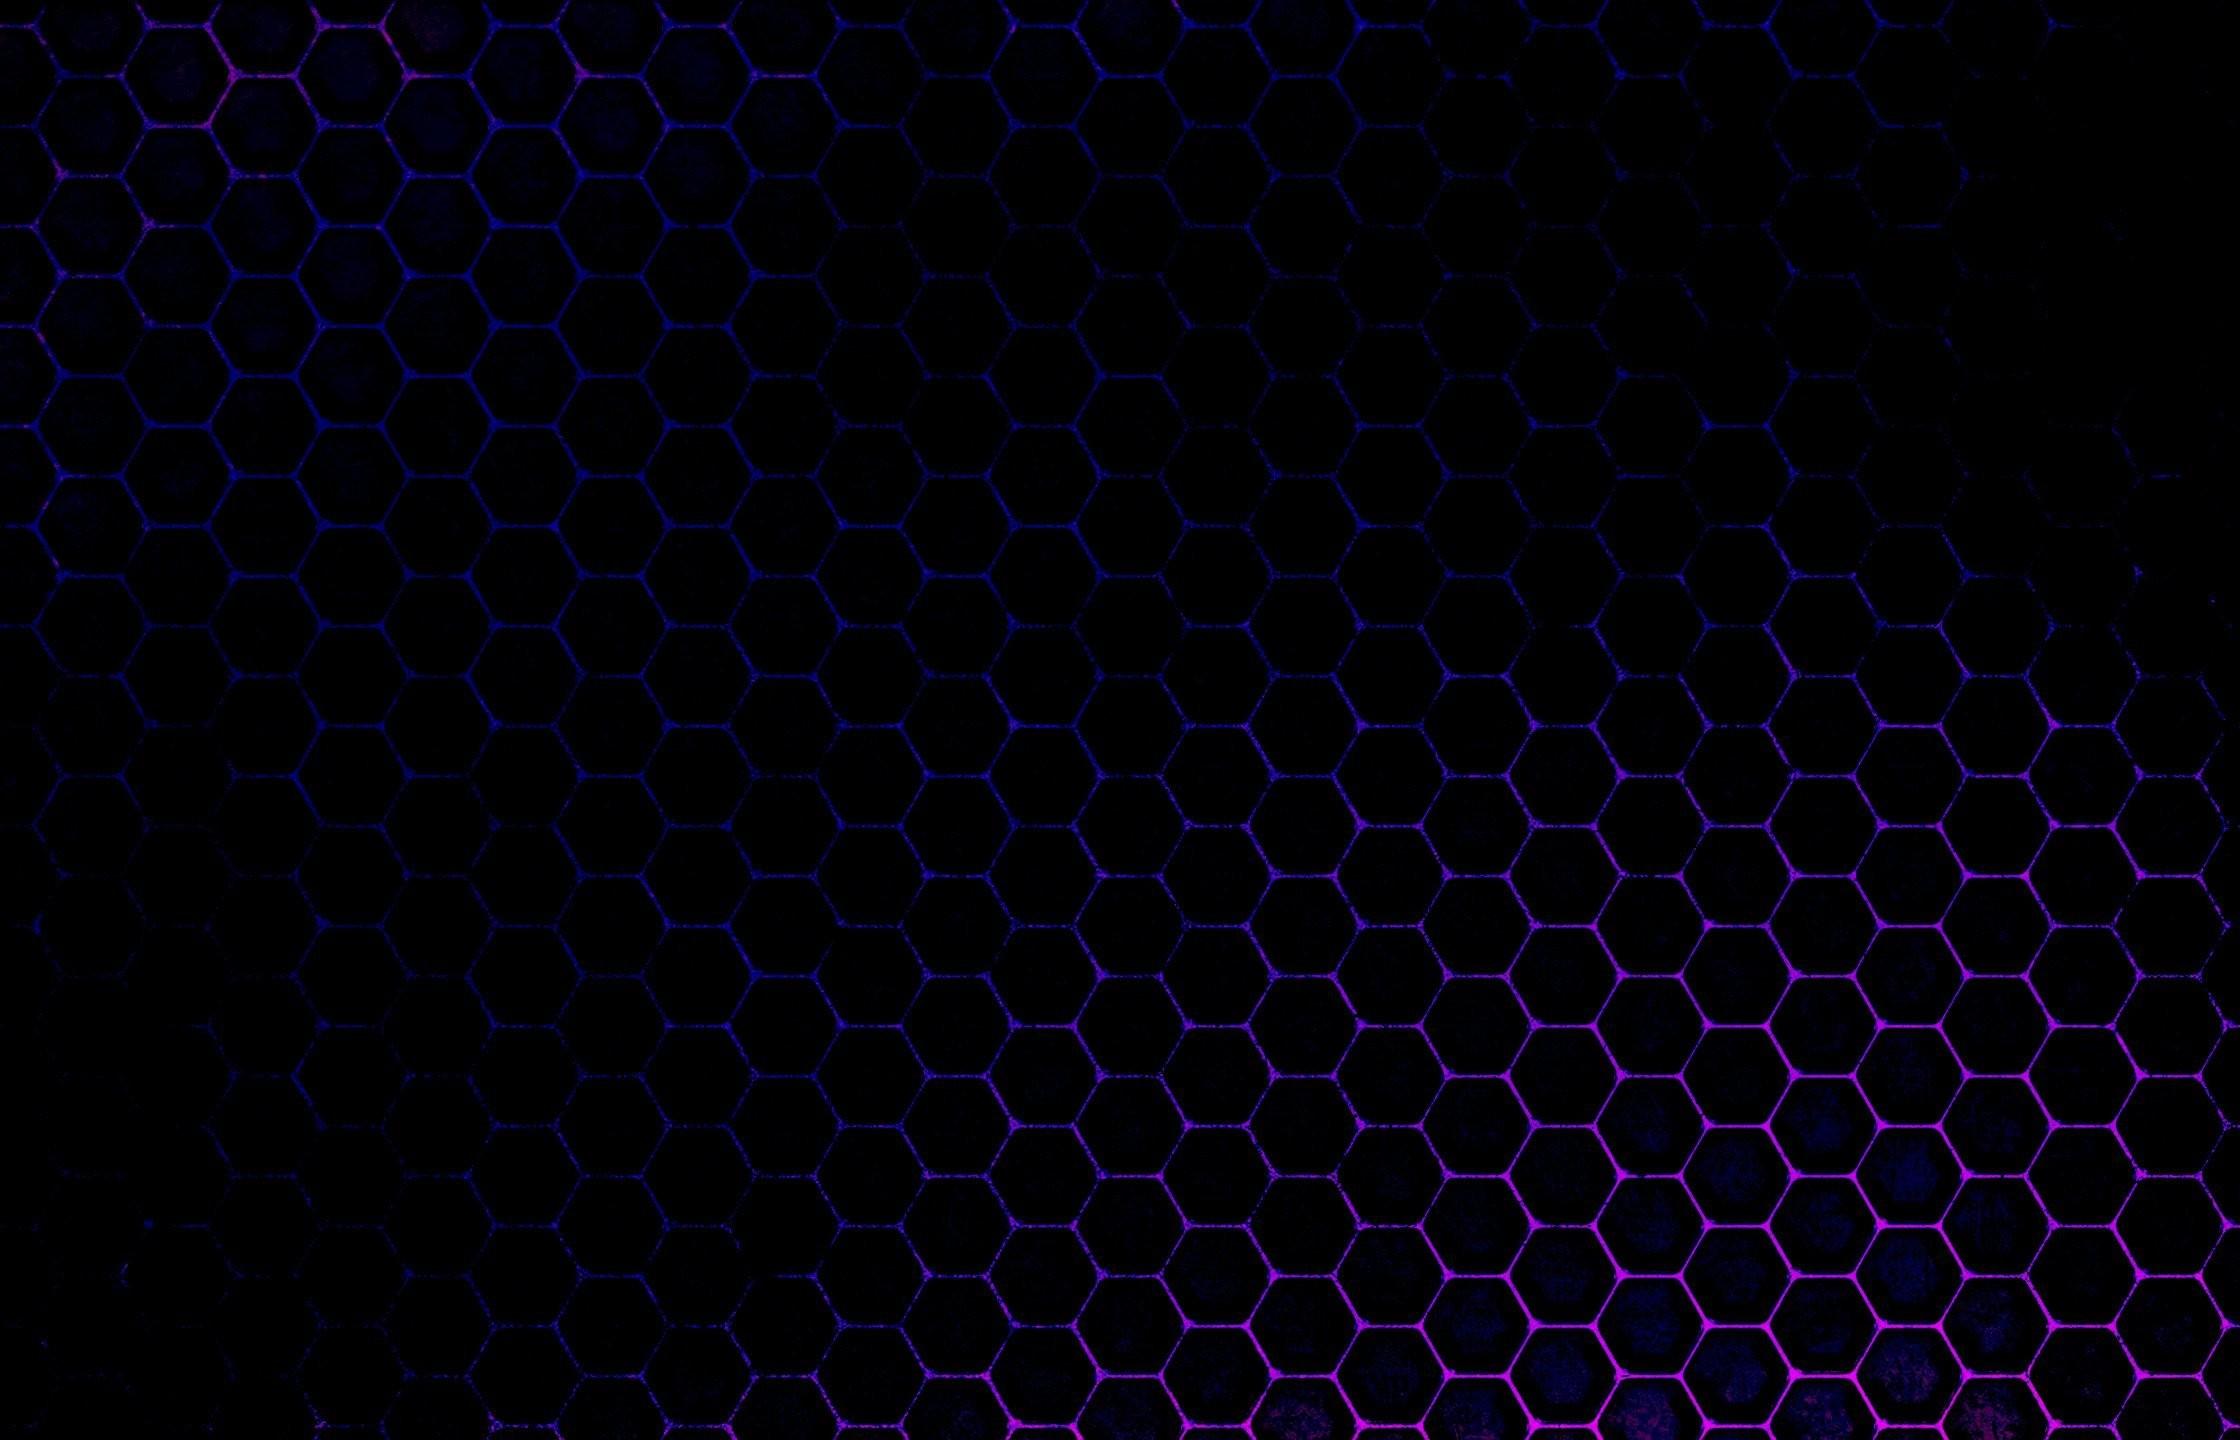 Black Wallpapers Free Download: Pure Black Wallpaper ·① Download Free Stunning HD